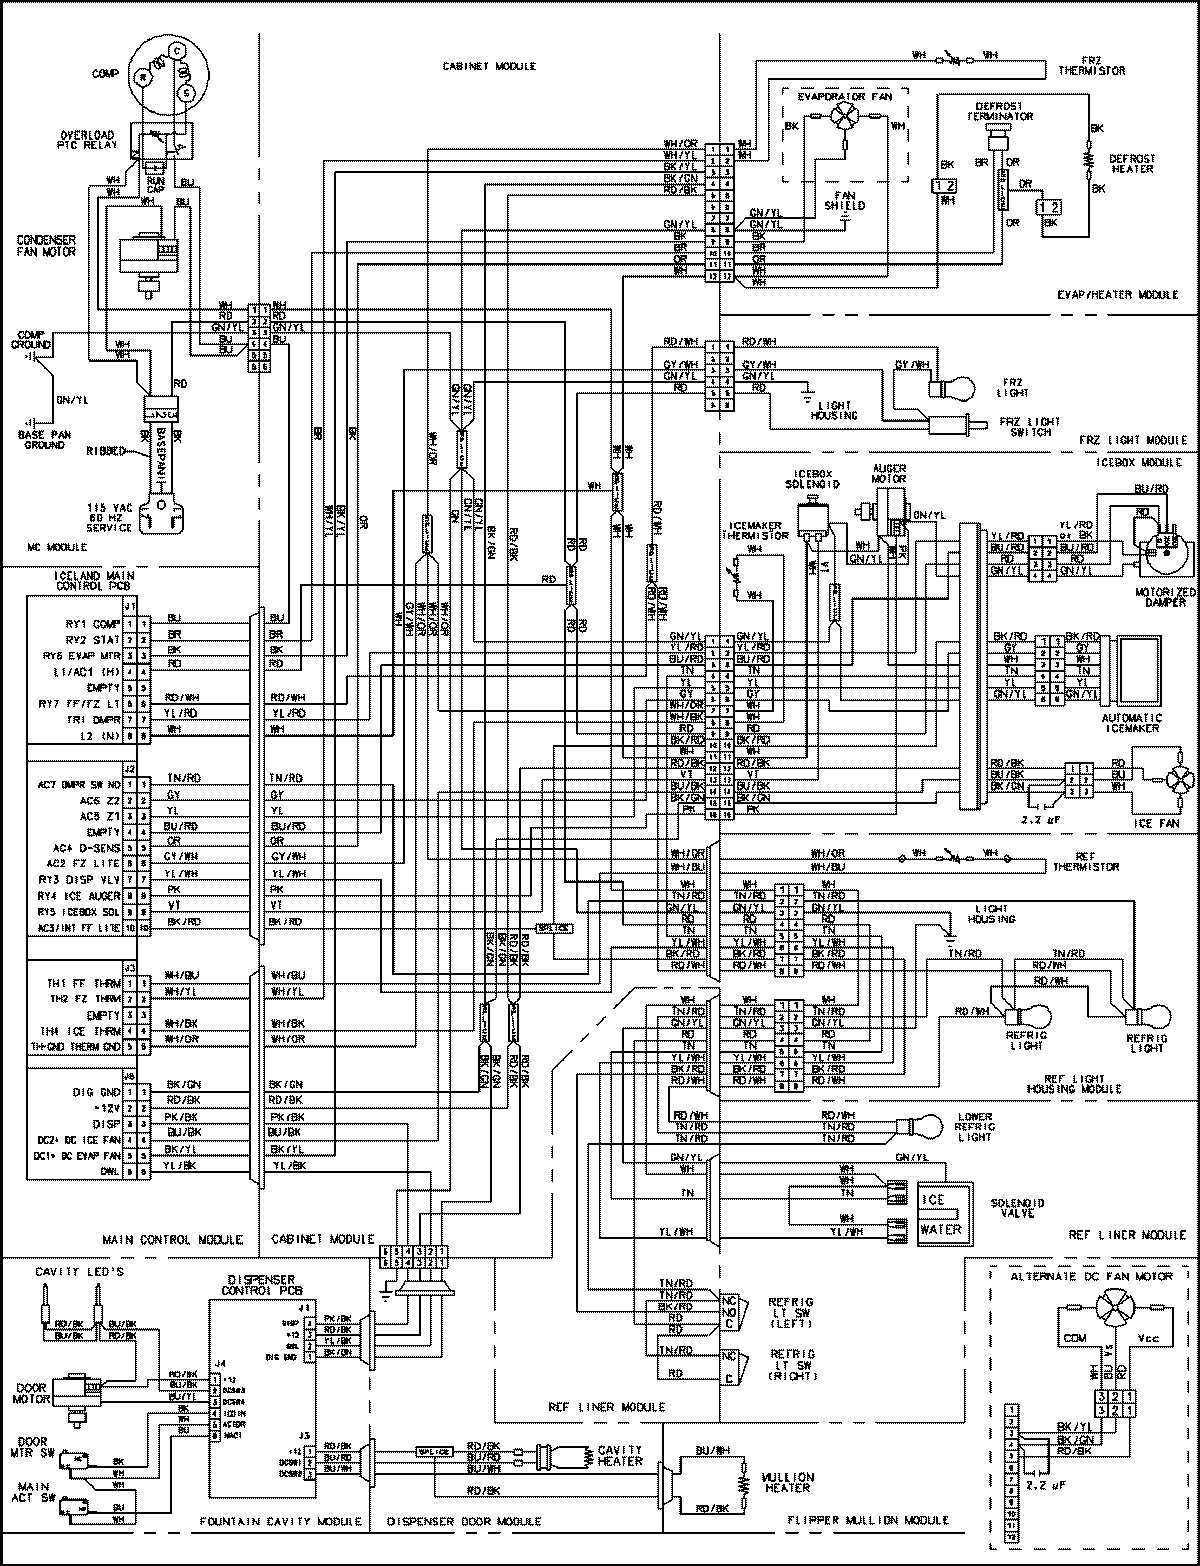 ge dryer wire diagram